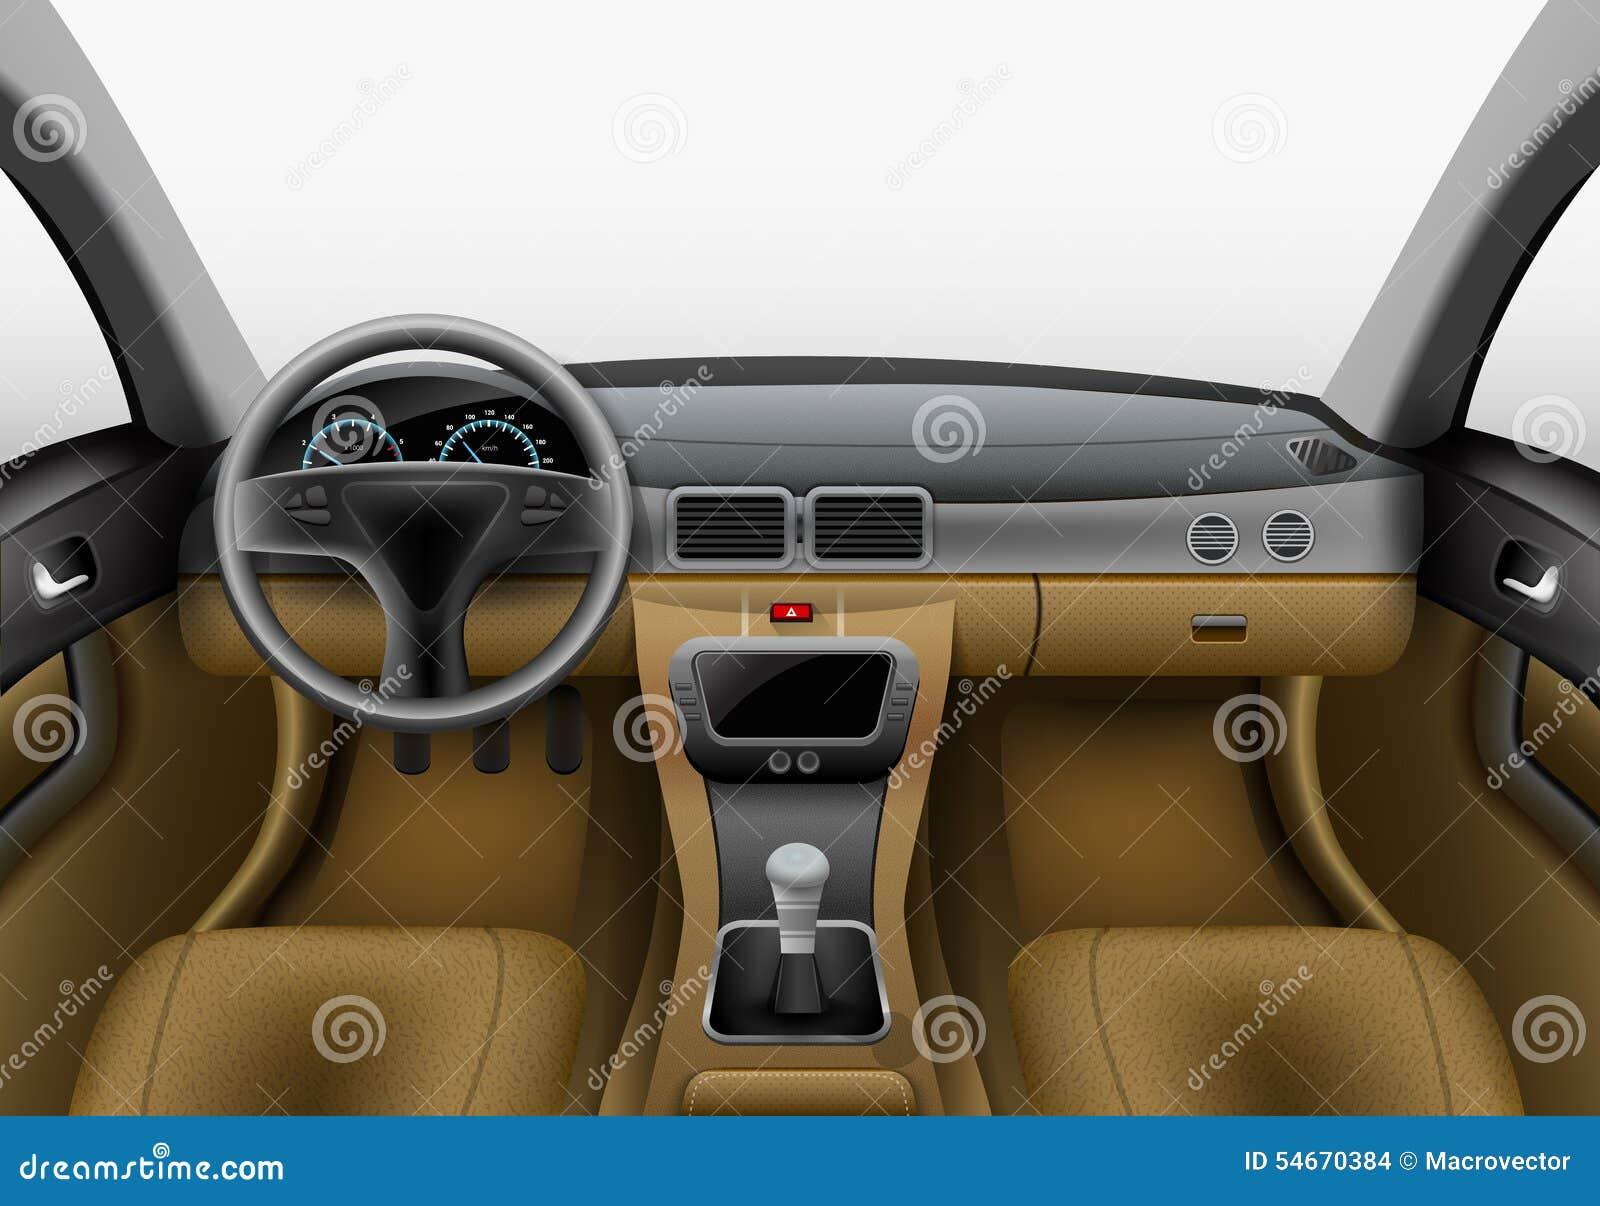 car interior light stock vector image 54670384. Black Bedroom Furniture Sets. Home Design Ideas